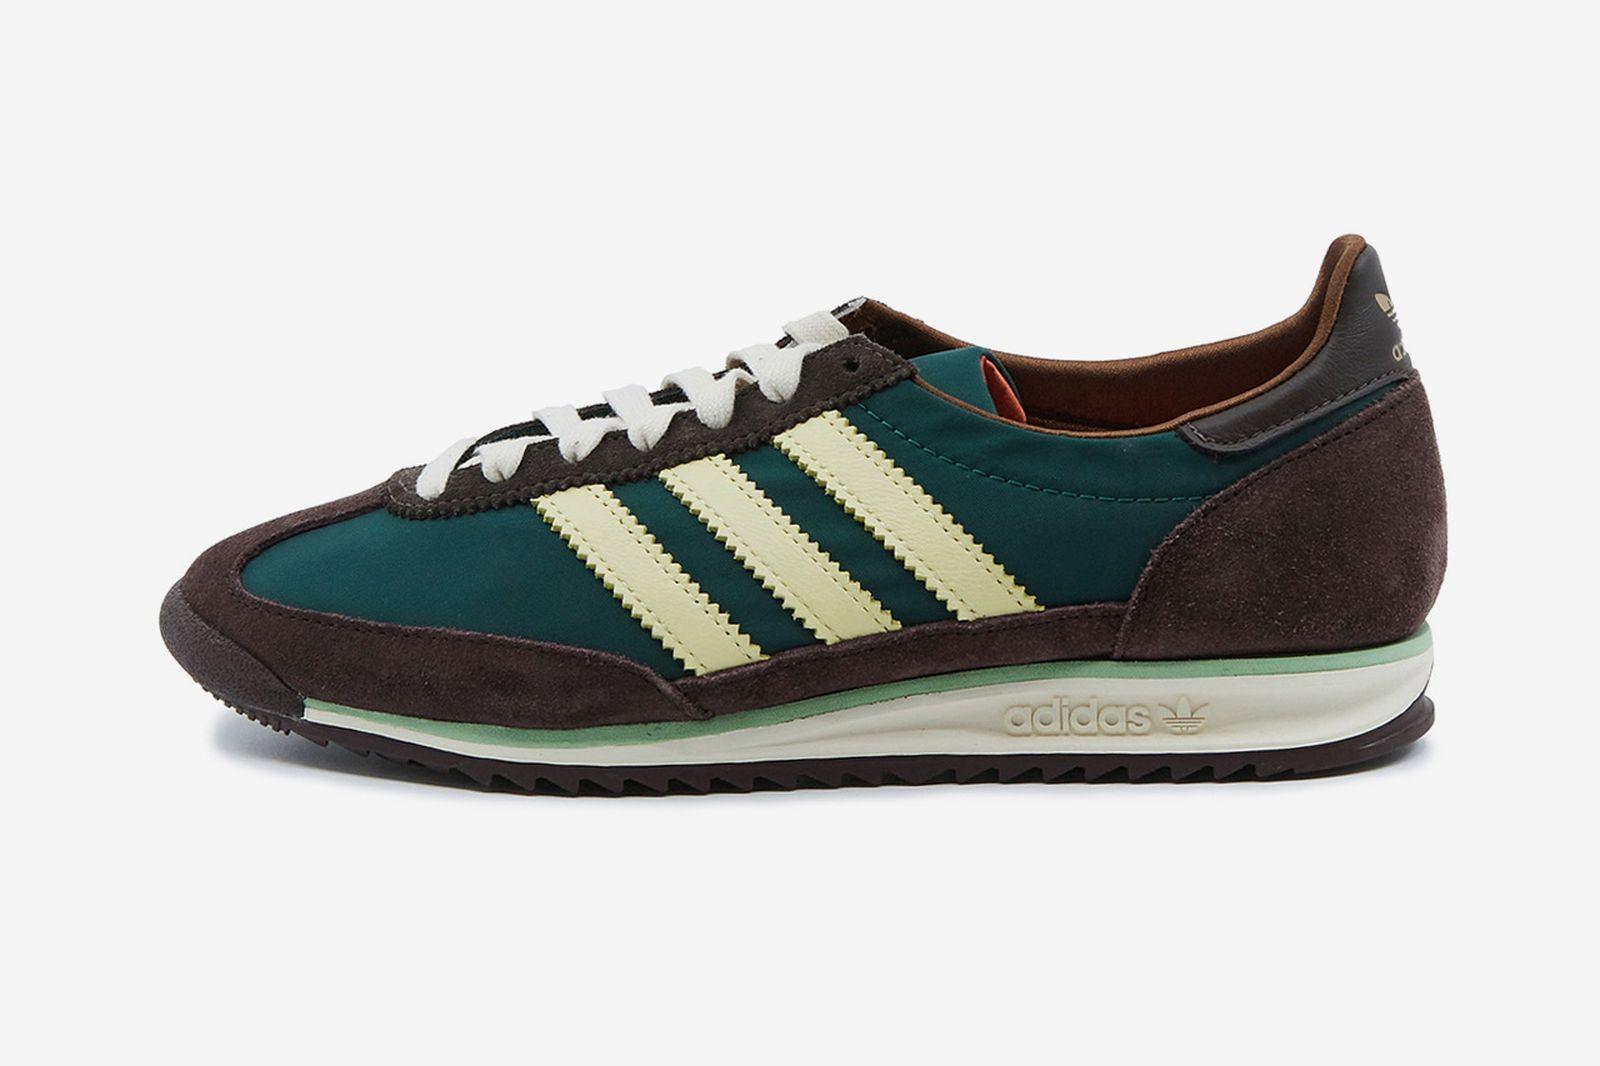 wales-bonner-adidas-originals-samba-release-date-price-02